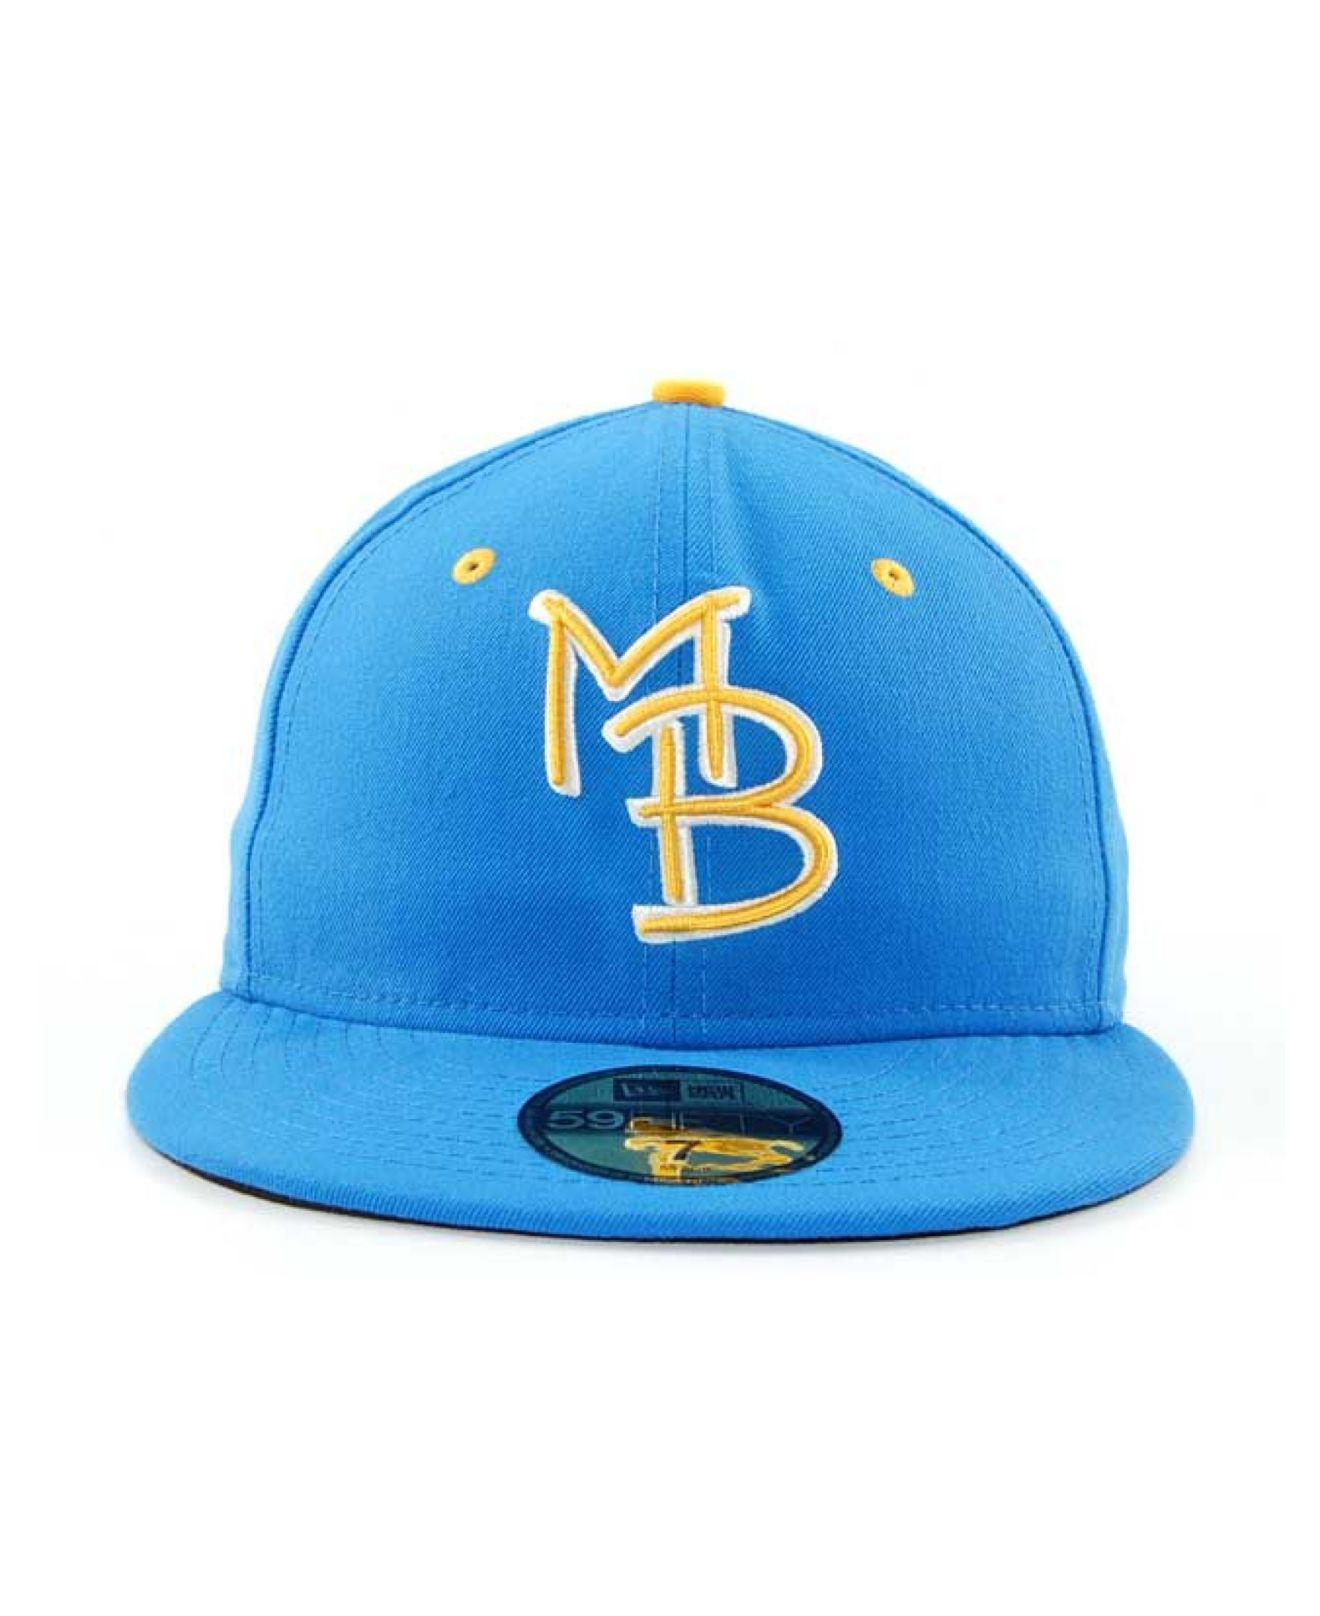 Ktz Myrtle Beach Pelicans Milb 59fifty Cap In Blue For Men